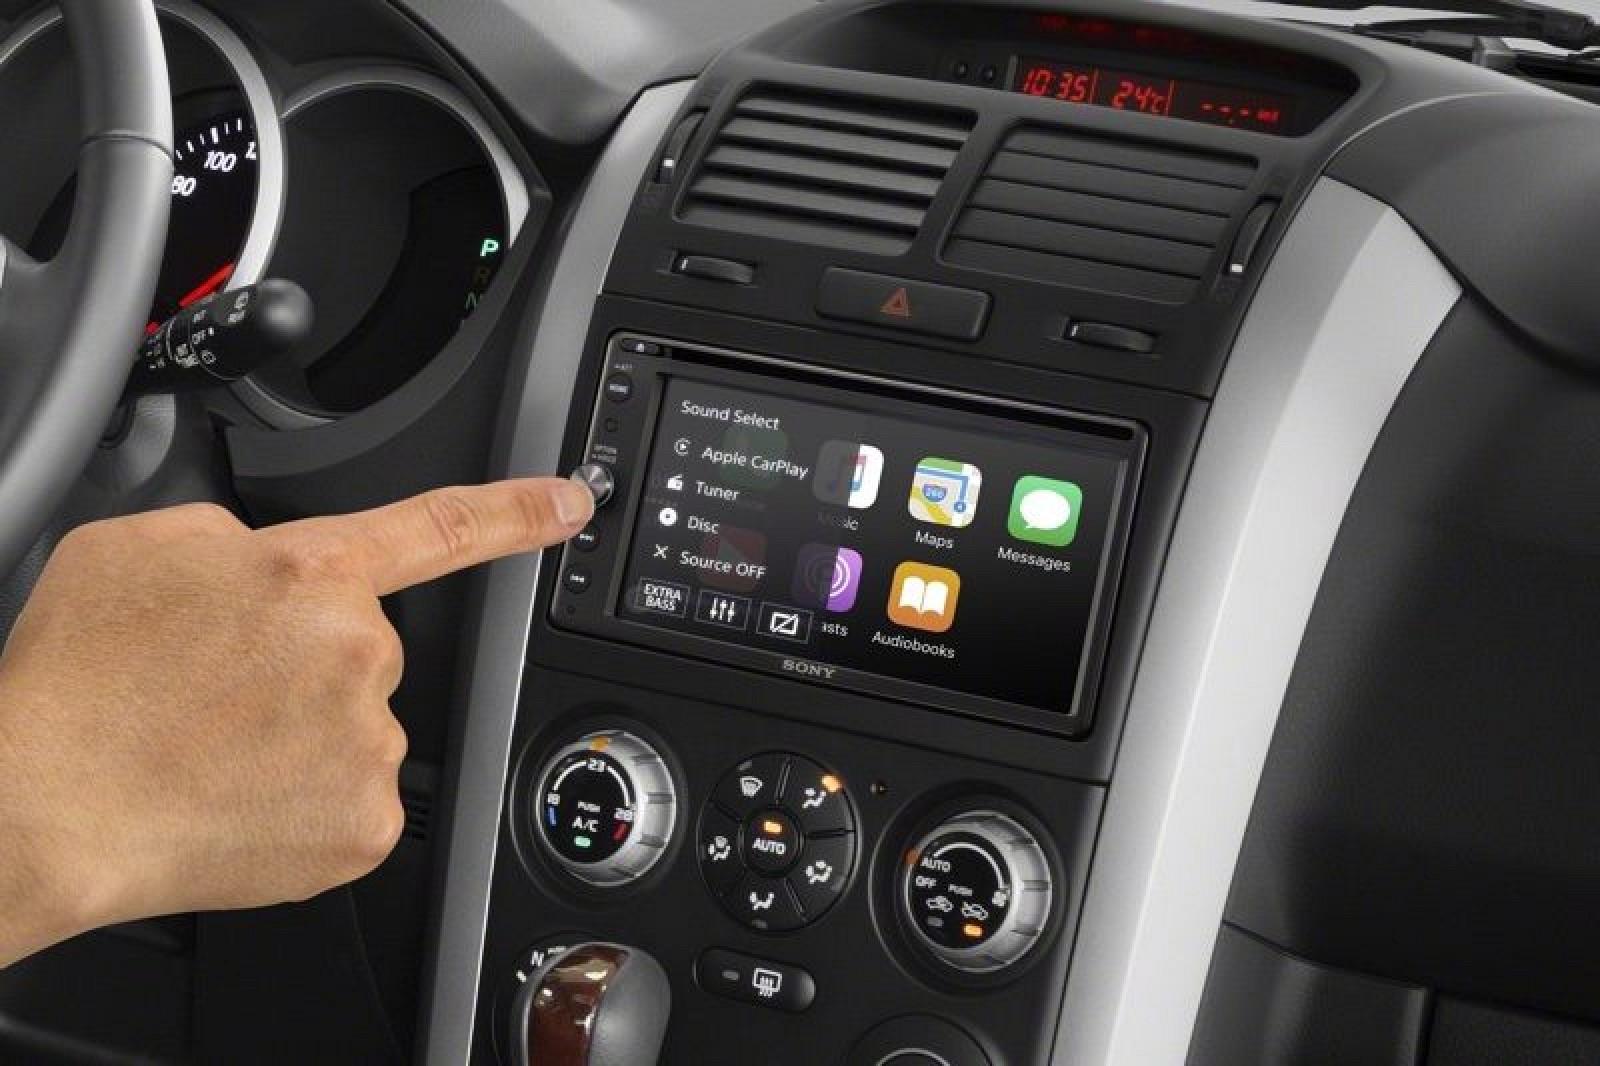 Sony Introduces New Aftermarket Carplay And Siri Eyes Free Systems Car Stereo Models Macrumors